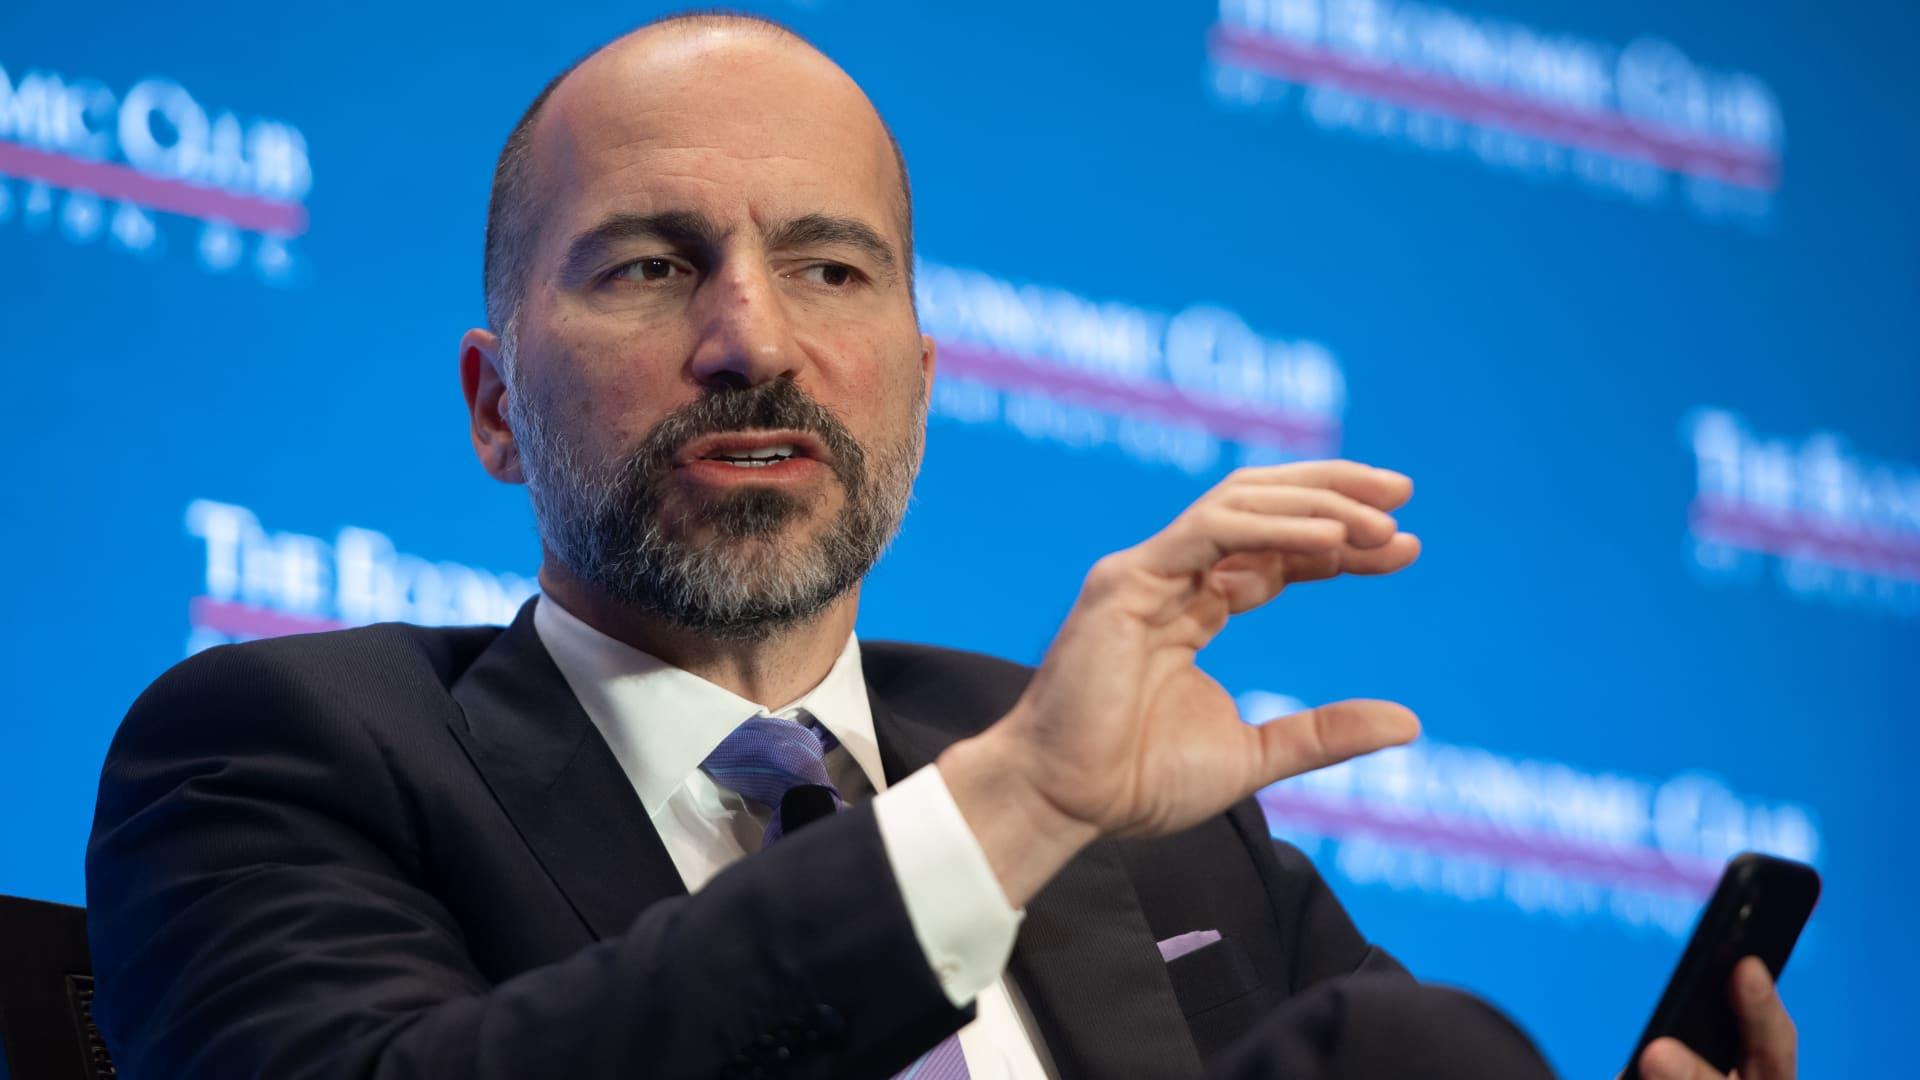 Dara Khosrowshahi, CEO of Uber Technologies, speaks during an Economic Club of Washington event in Washington, DC, June 11, 2019.